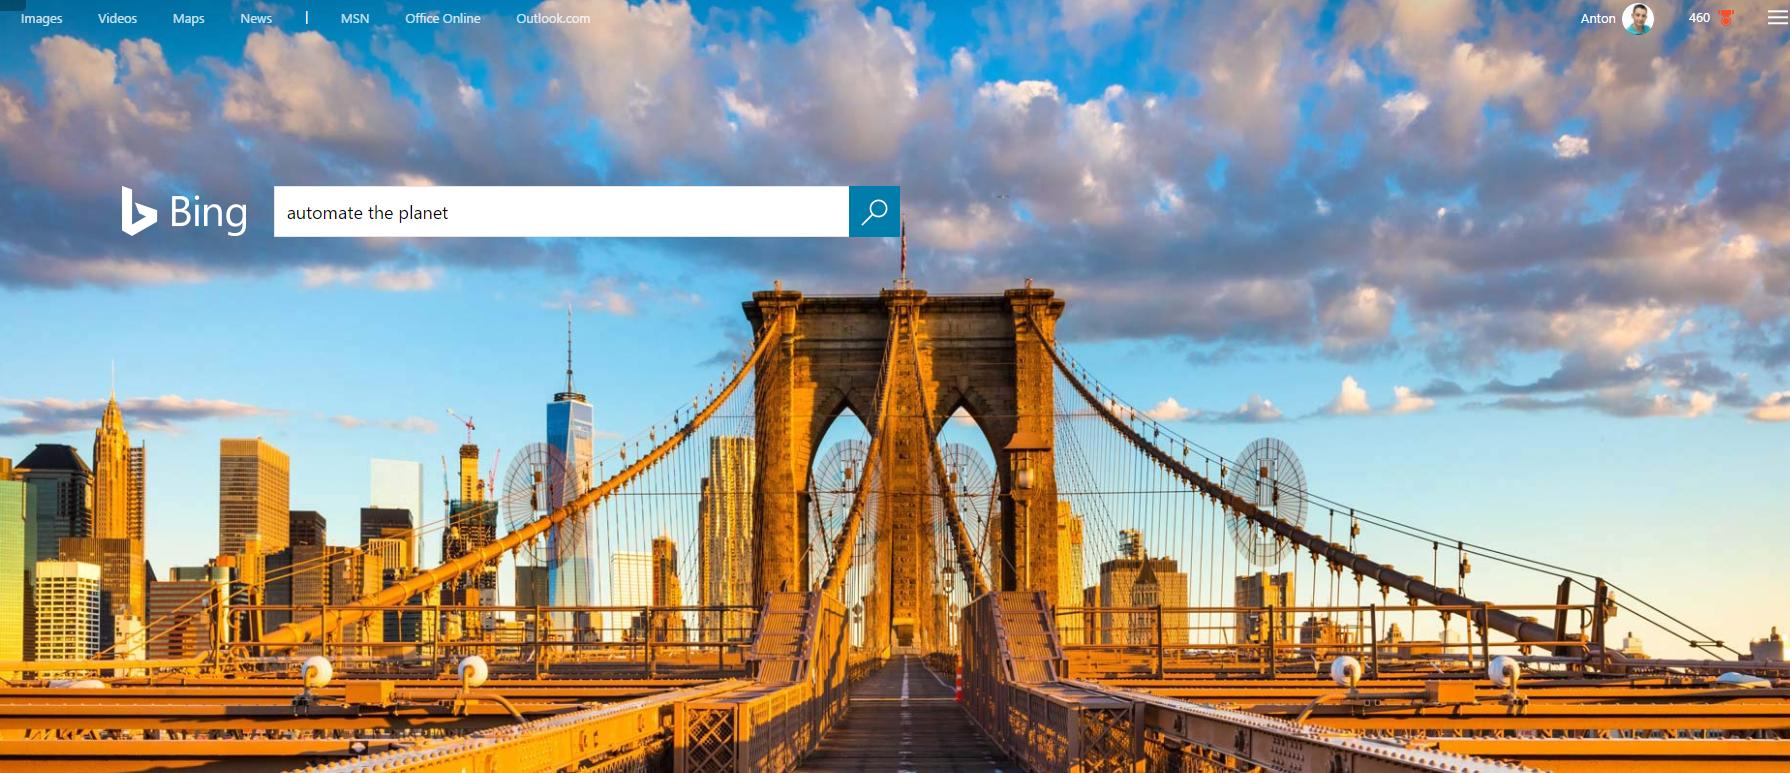 Bing main page